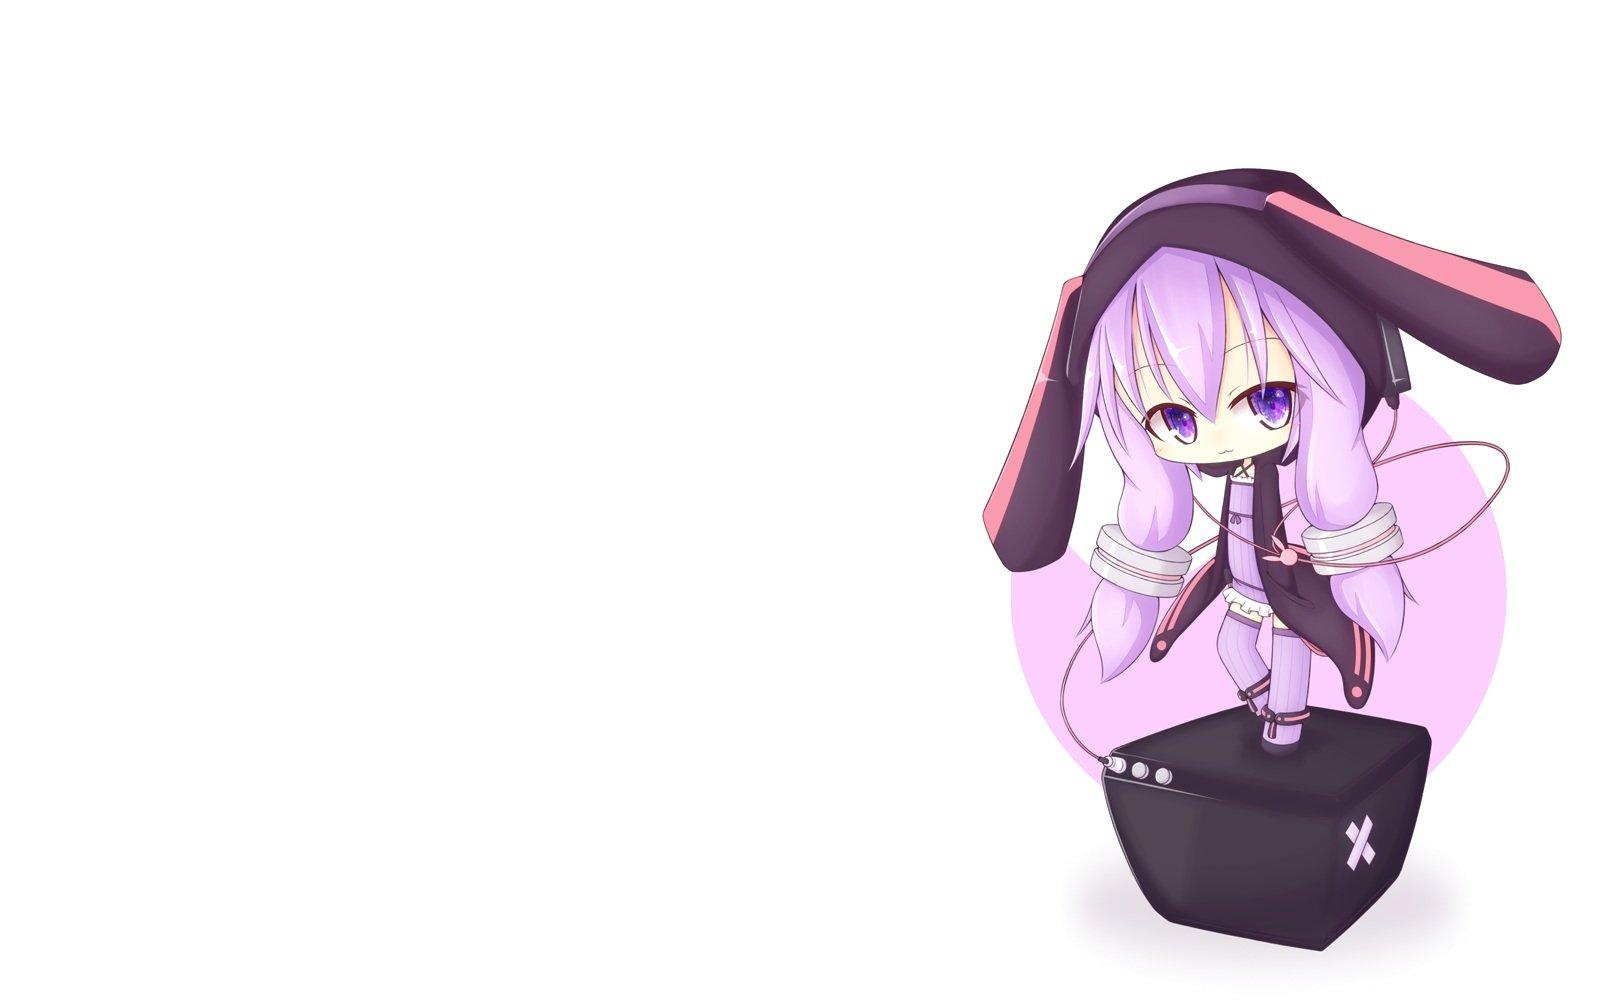 Chibi Headphones Anime Girl